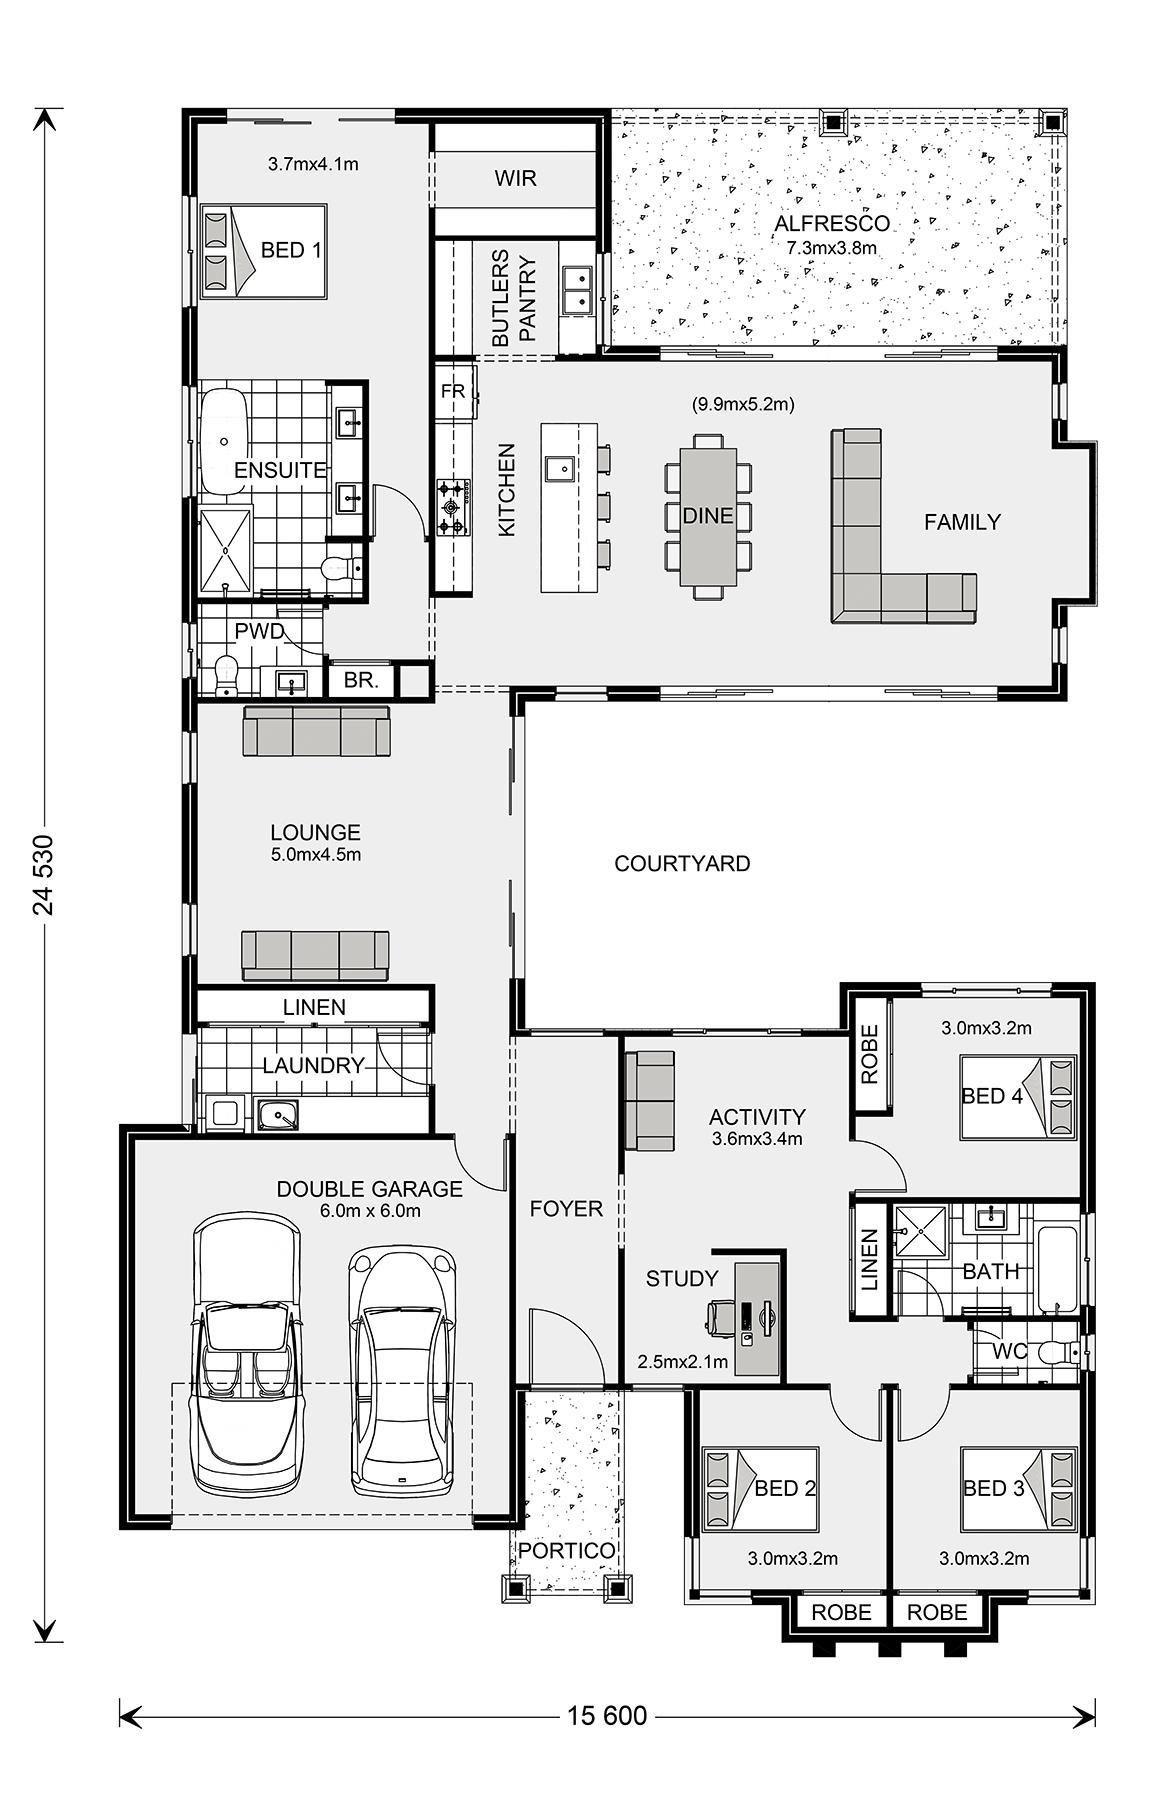 House Plans For Building 2021 Home Design Floor Plans U Shaped House Plans Courtyard House Plans